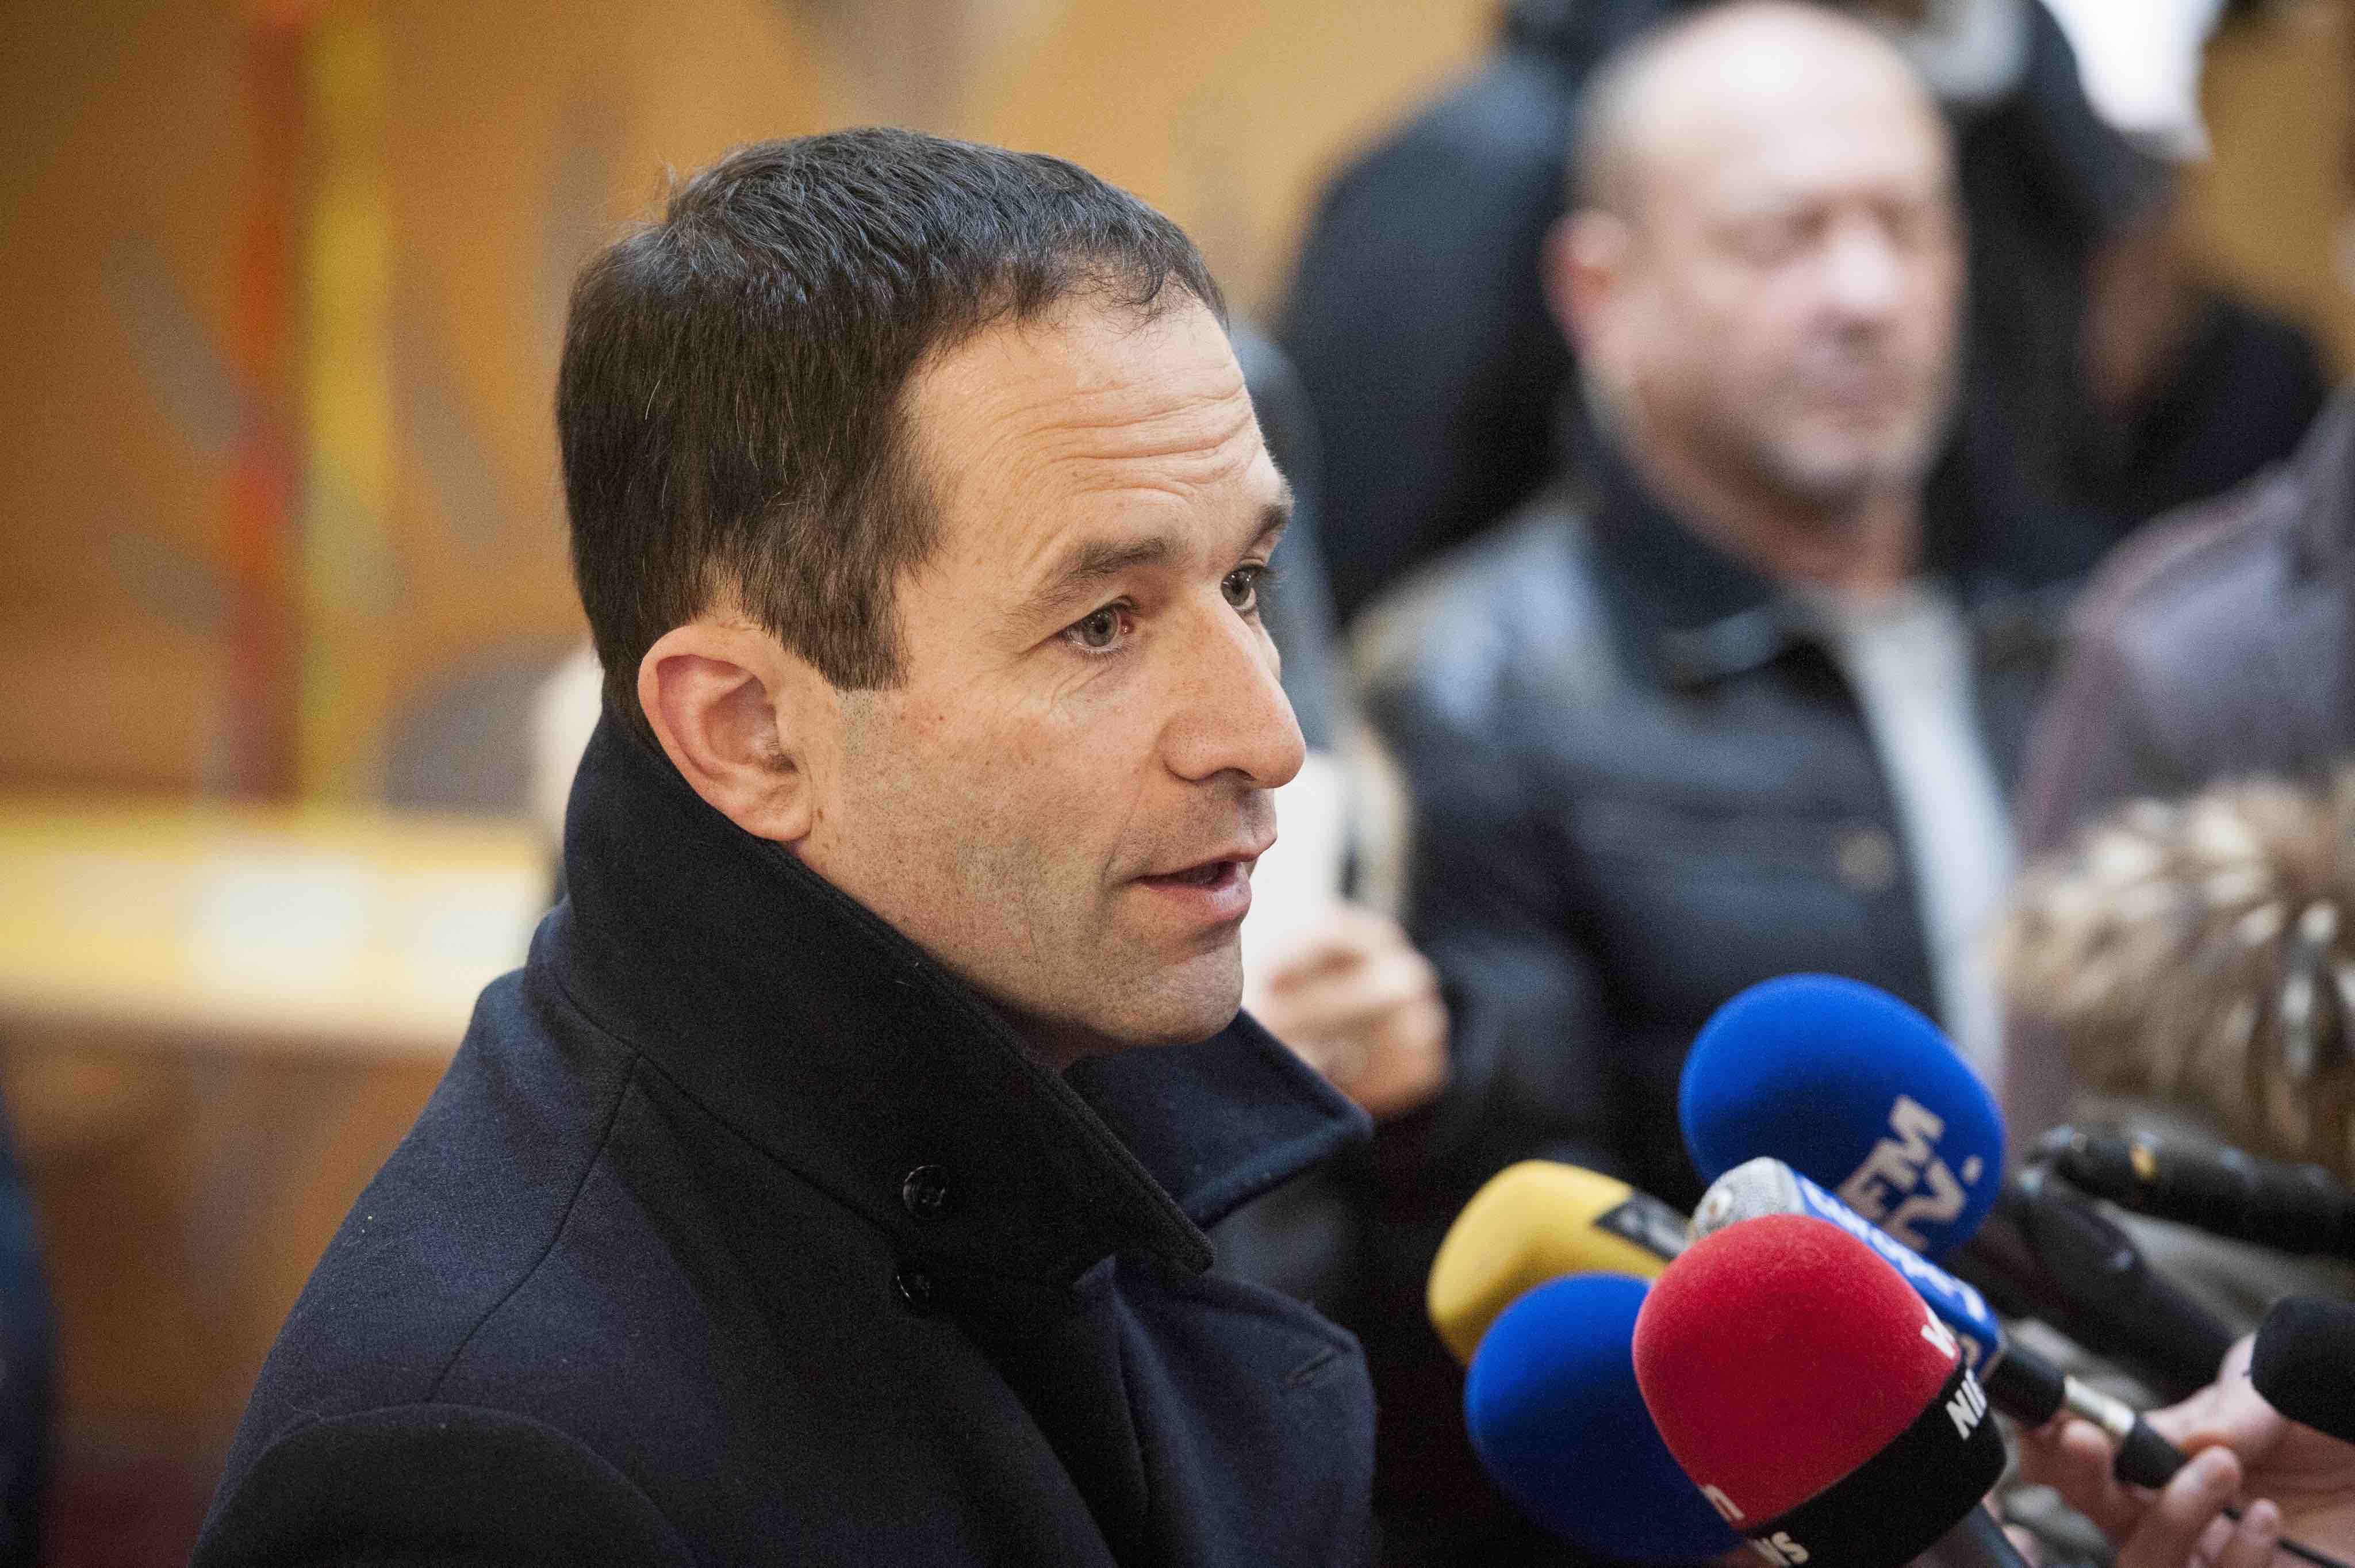 Benoît Hamon presta declarações aos jornalistas. Foto Jeremy Lempin/EPA/Lusa.